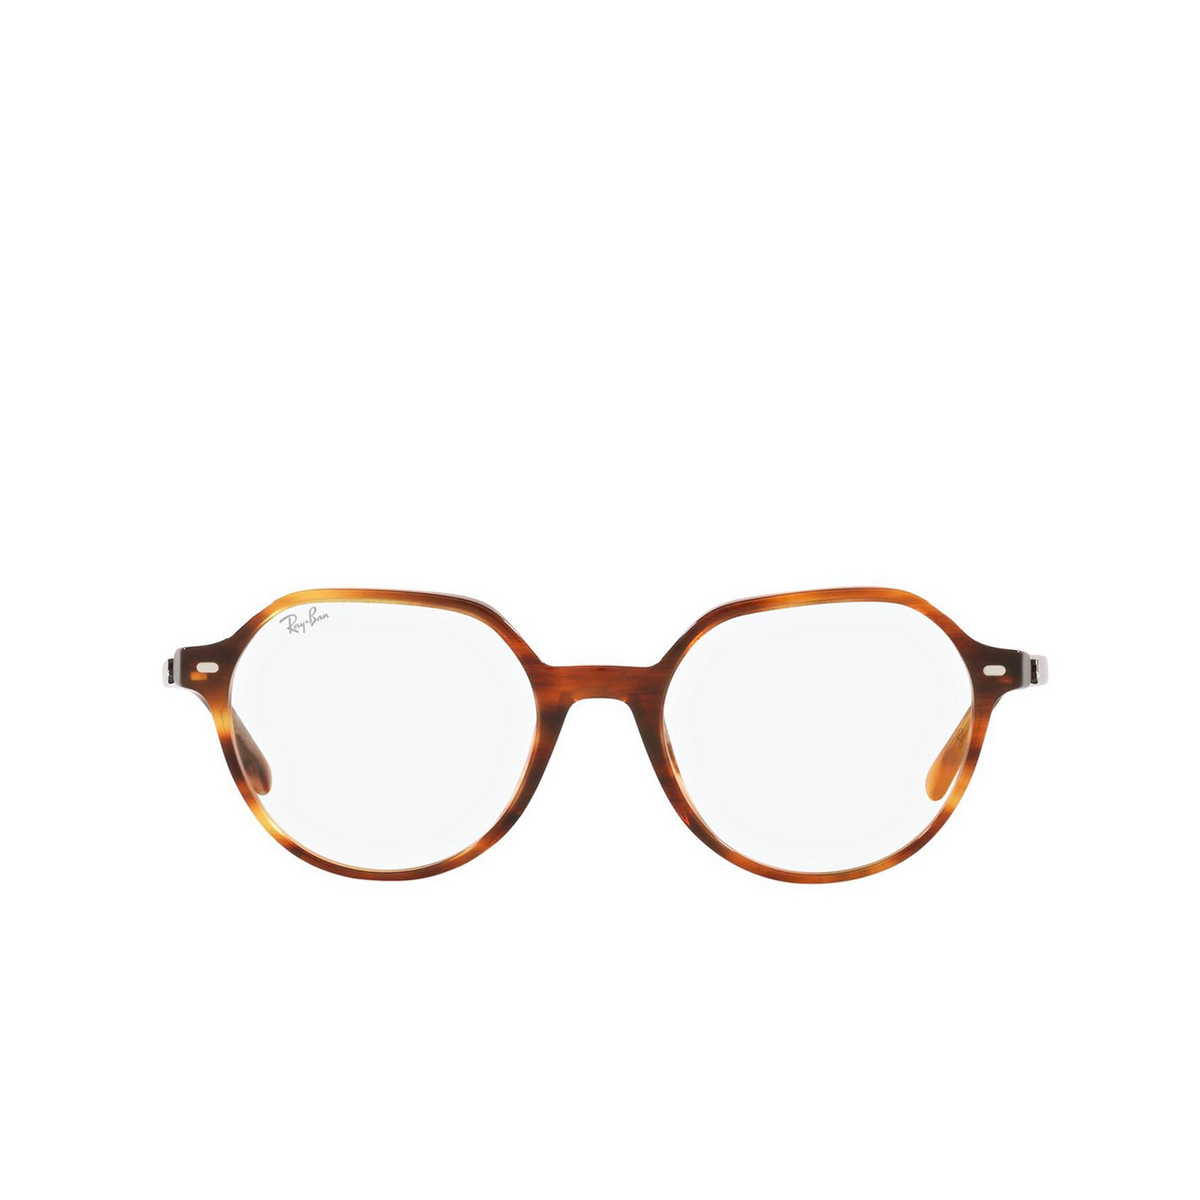 Ray-Ban® Irregular Eyeglasses: Thalia RX5395 color Striped Havana 2144.